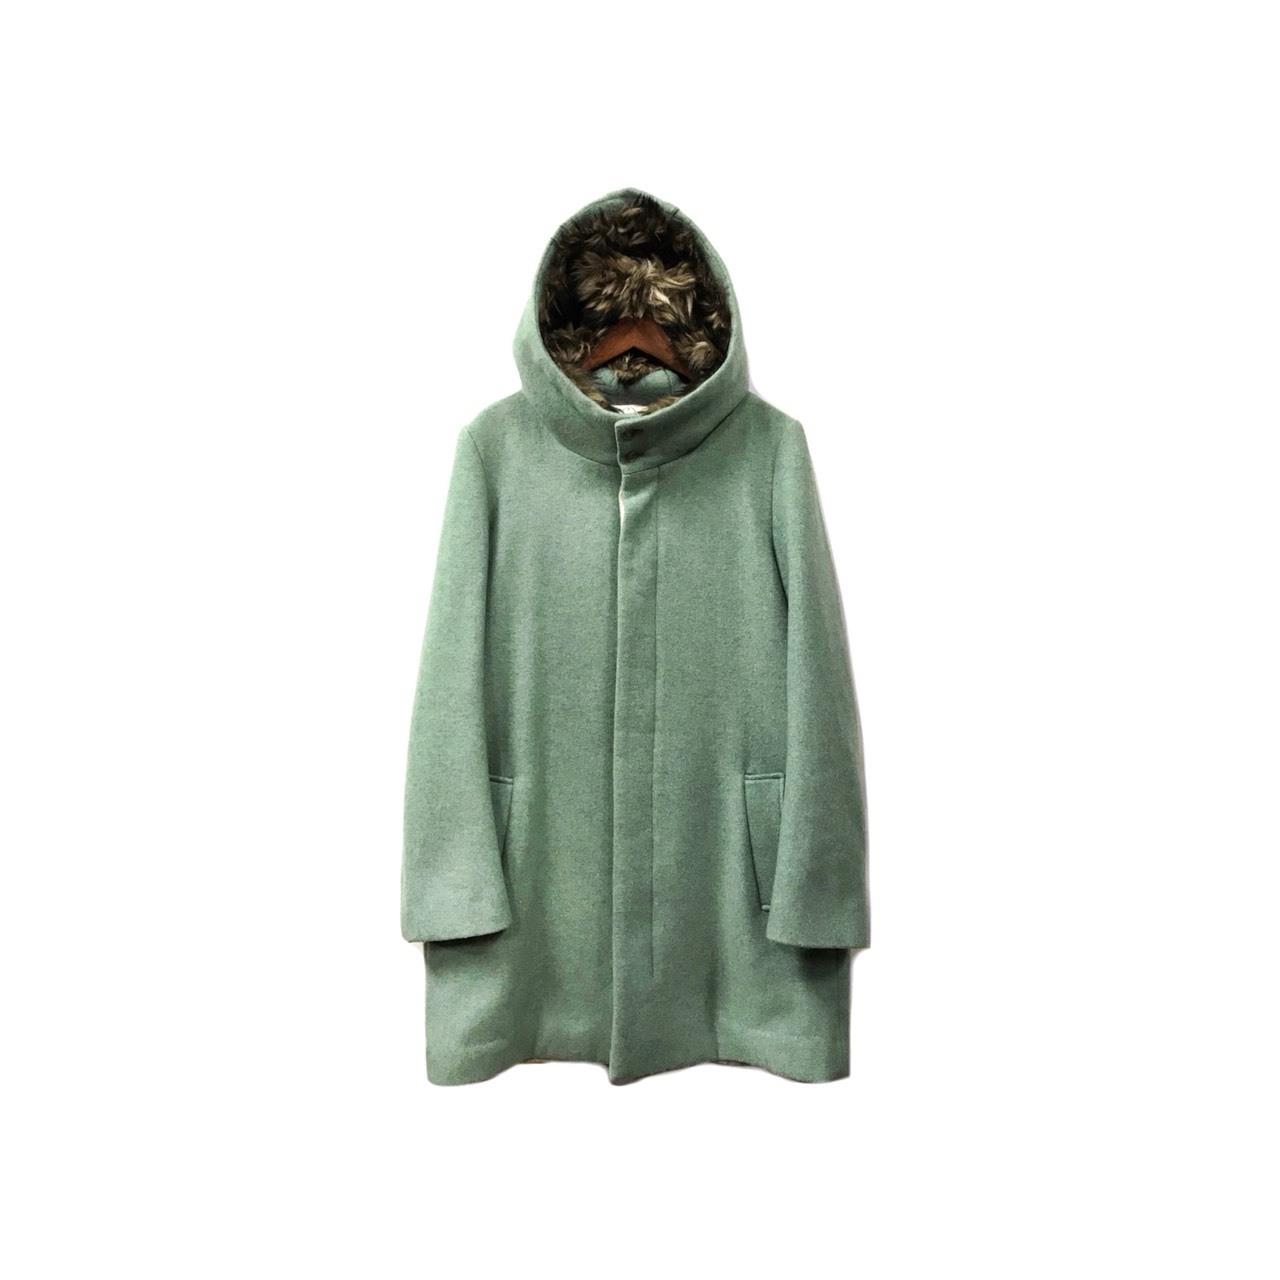 ohta - Melton Hooded Coat (size - S/M) ¥28000+tax → ¥22400+tax